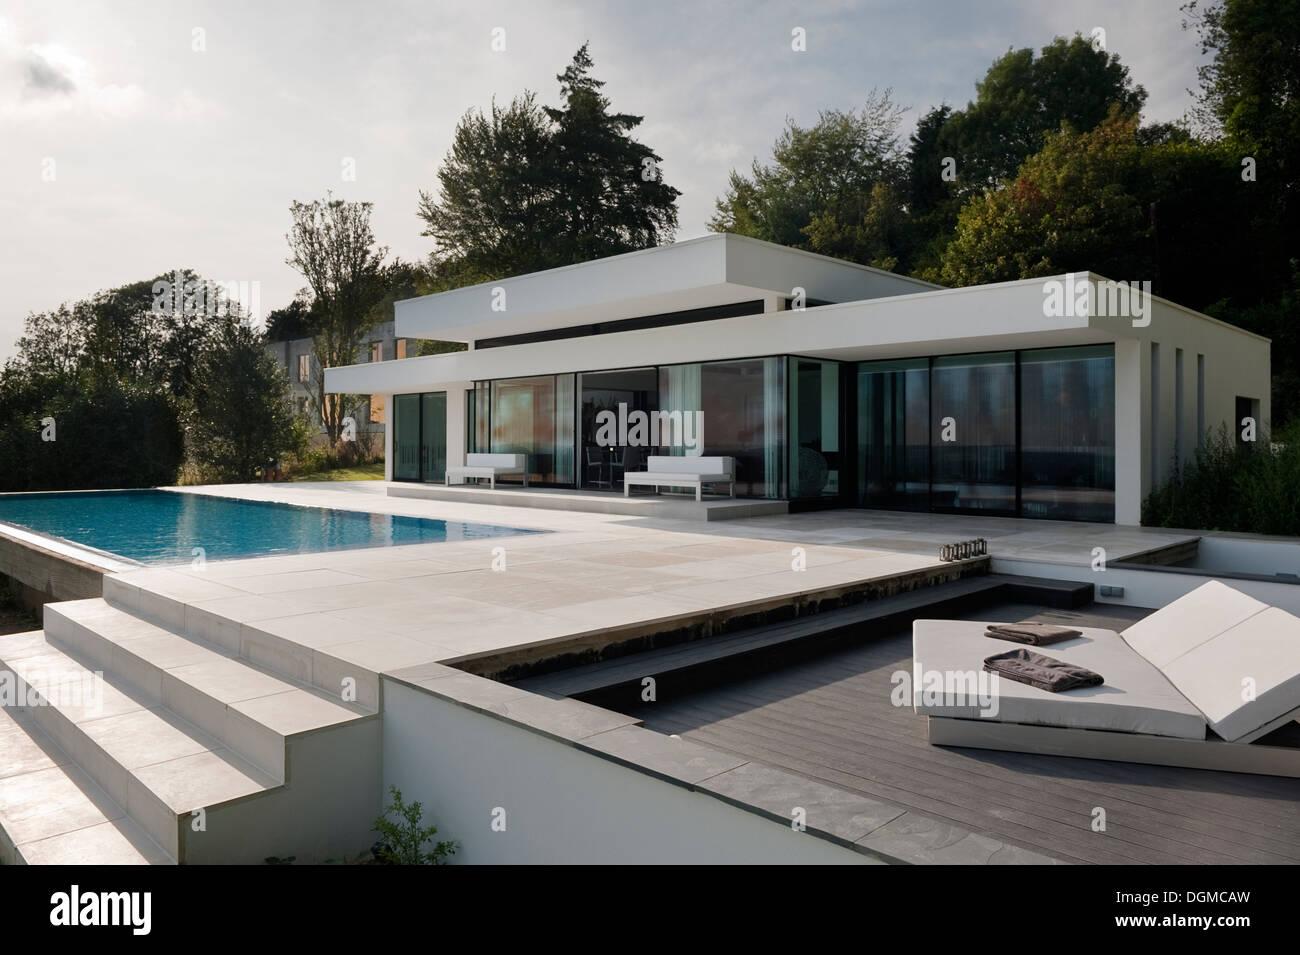 moderner bungalow mit infinity pool in kent sussex grenzen stockfoto bild 61914353 alamy. Black Bedroom Furniture Sets. Home Design Ideas